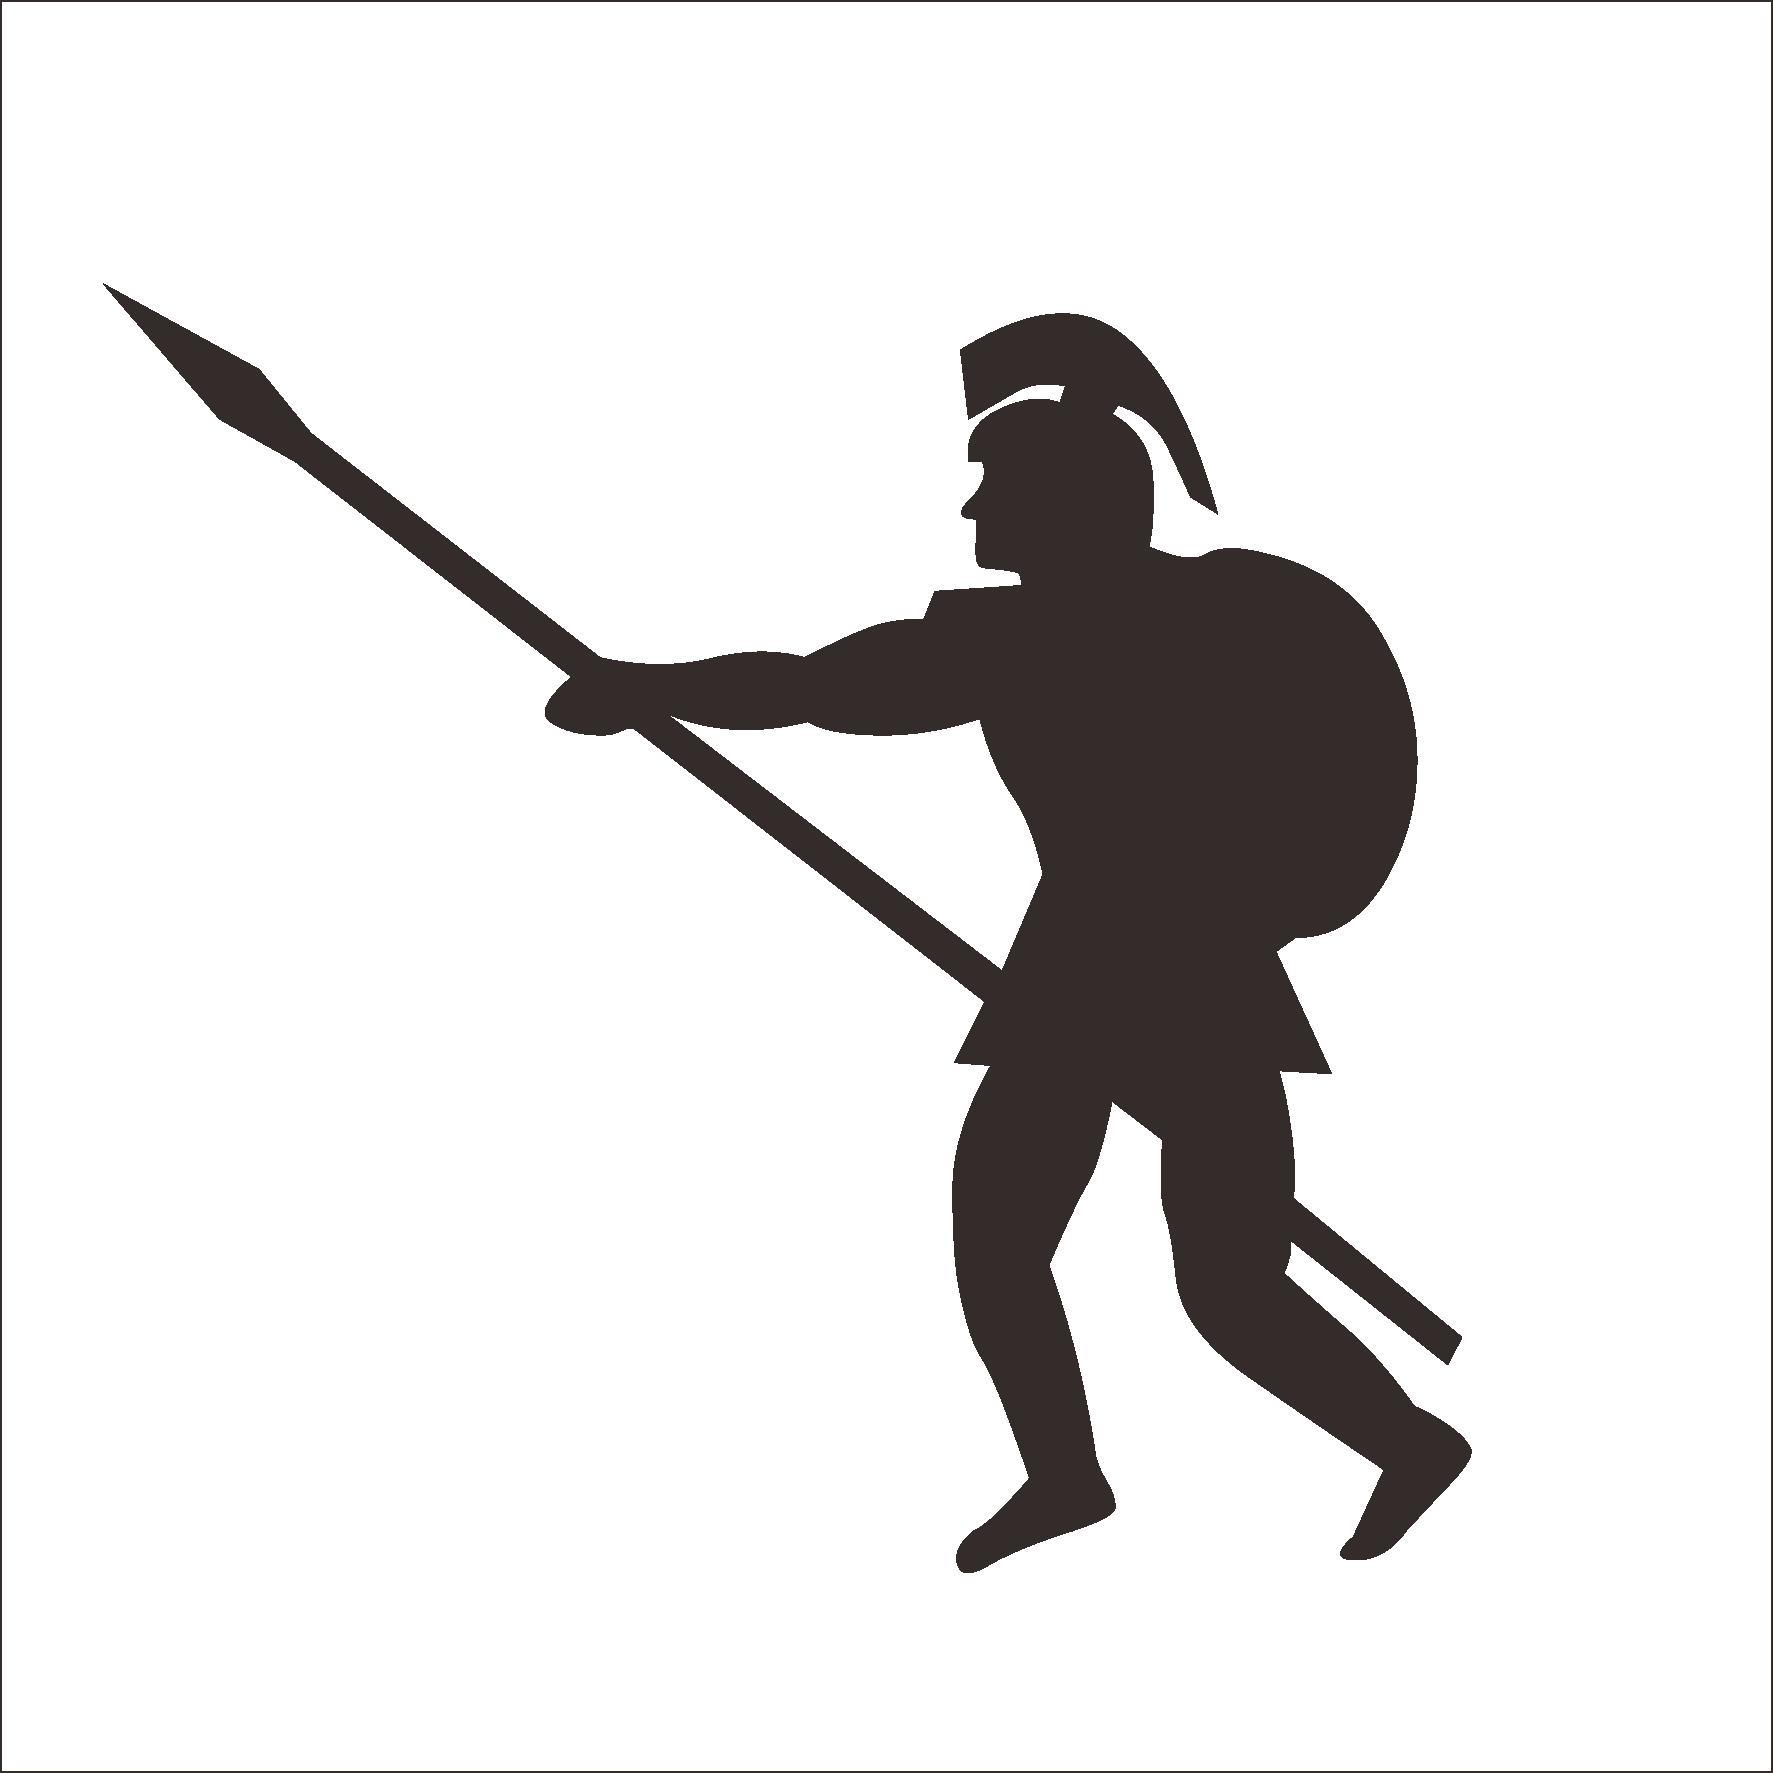 Ancient rome clip art. Silhouette clipart soldier